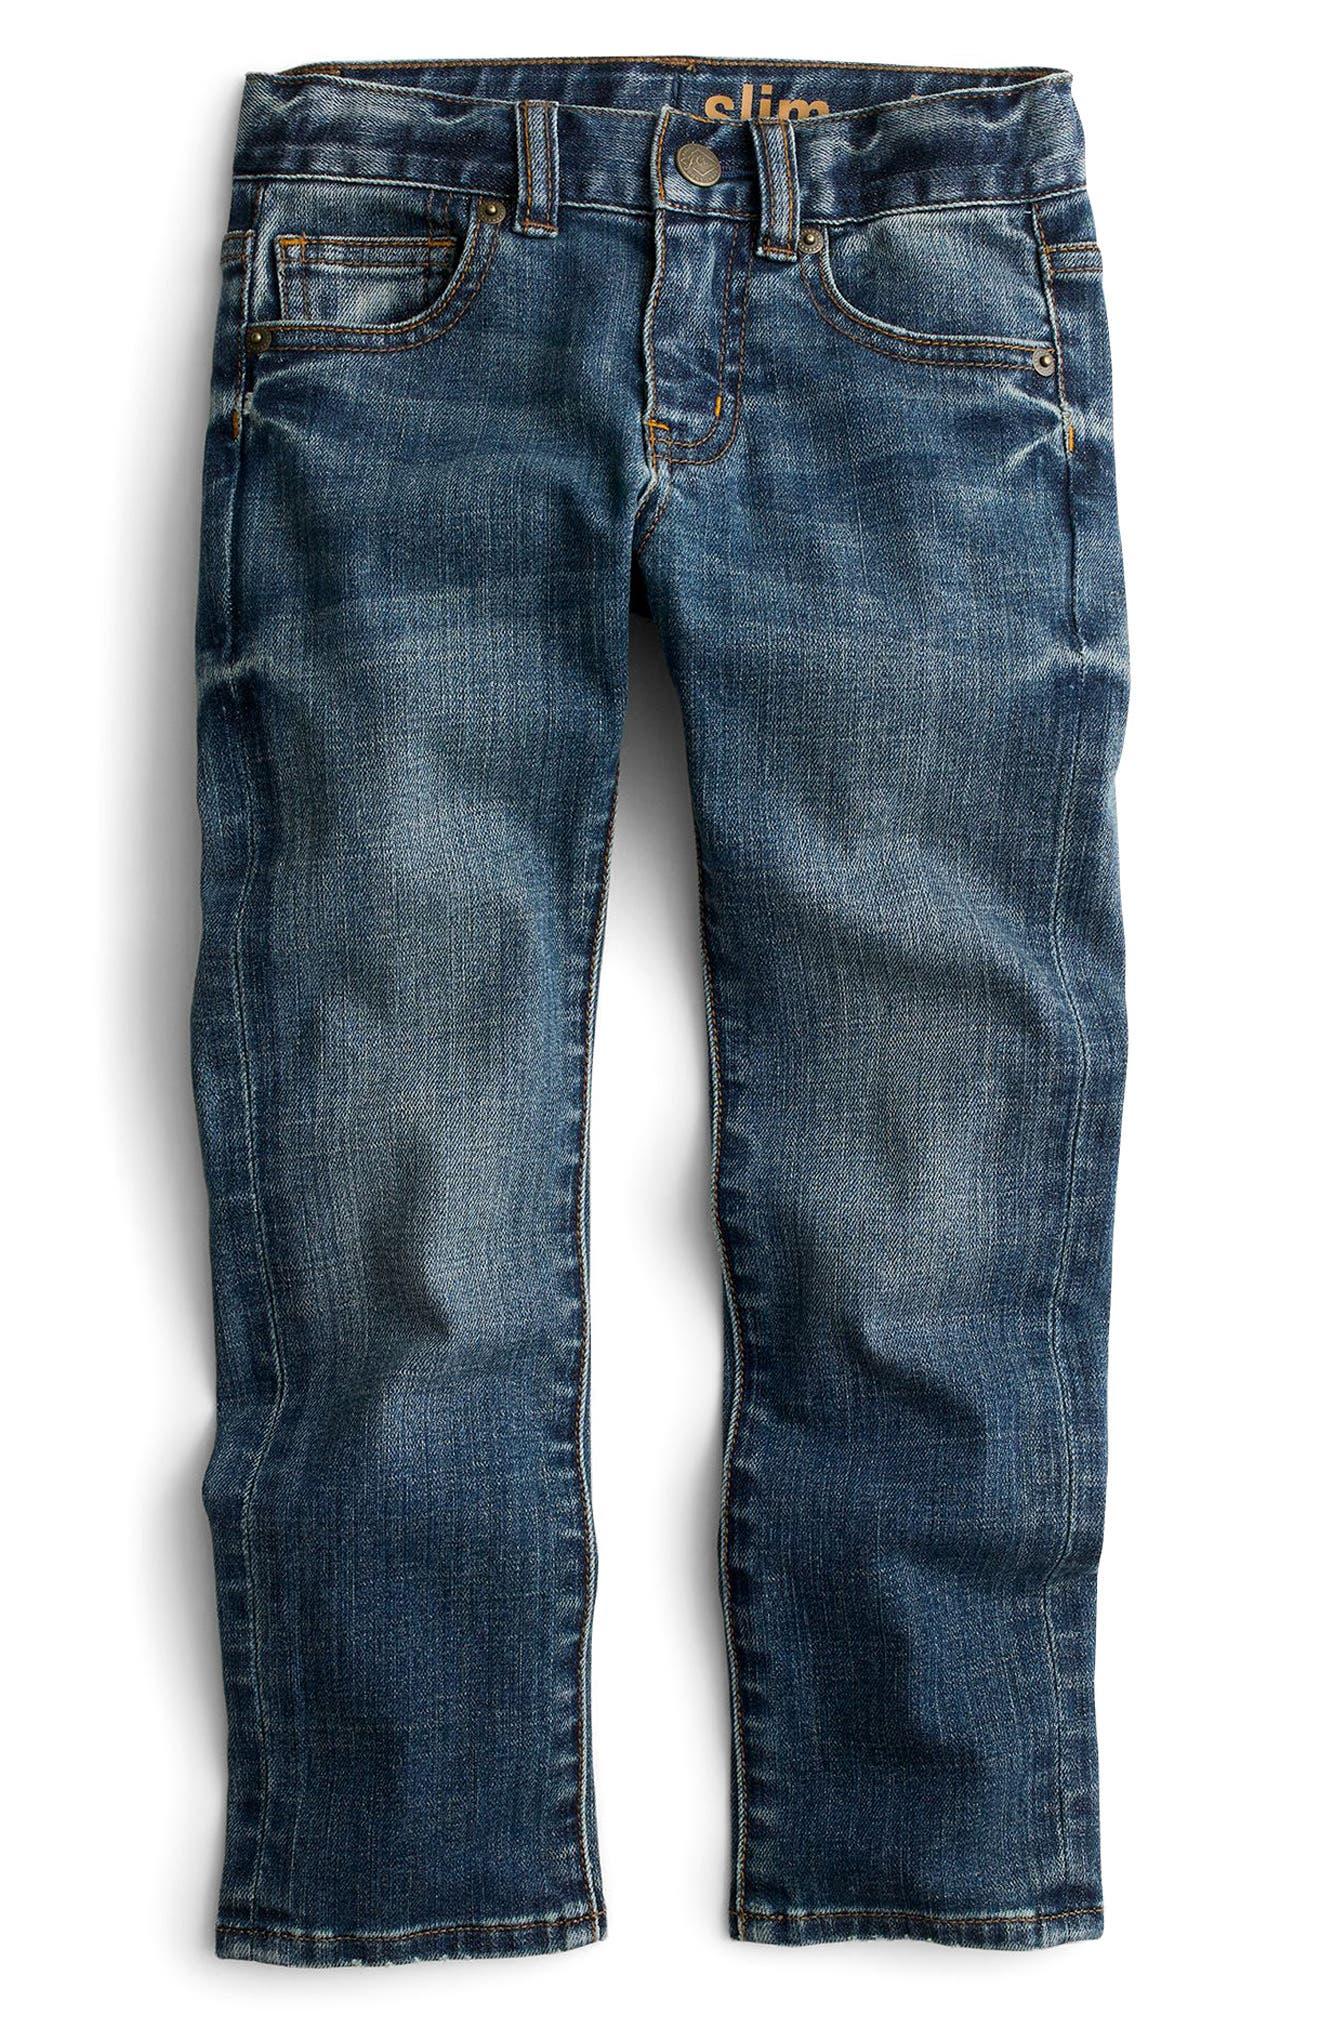 crewcuts by J.Crew Slim Fit Rugged Wash Jeans (Toddler Boys, Little Boys & Big Boys)